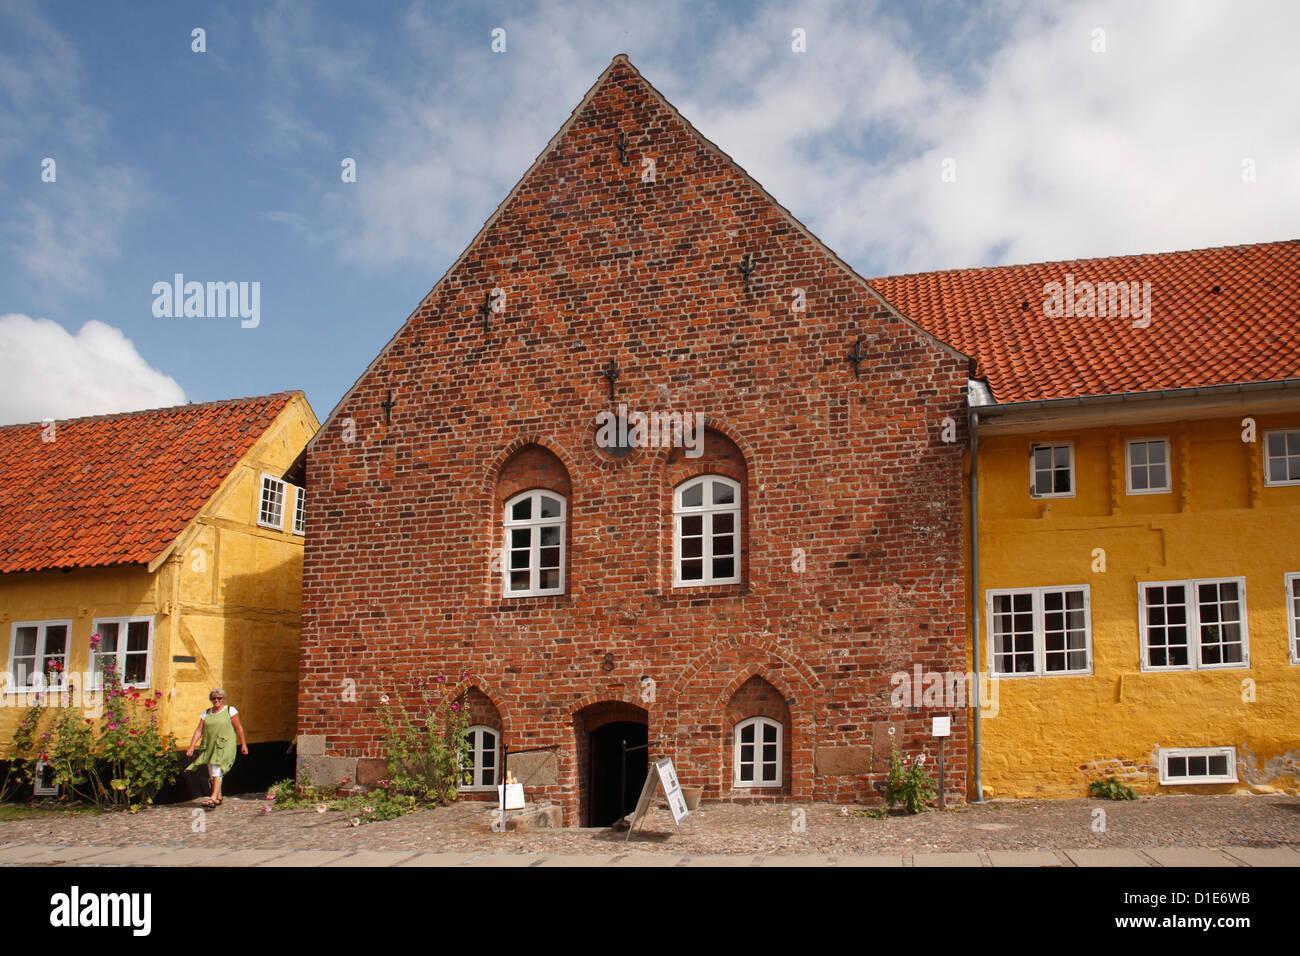 Old town hall, Kalundborg, Sjaelland, Denmark, Scandinavia, Europe - Stock Image